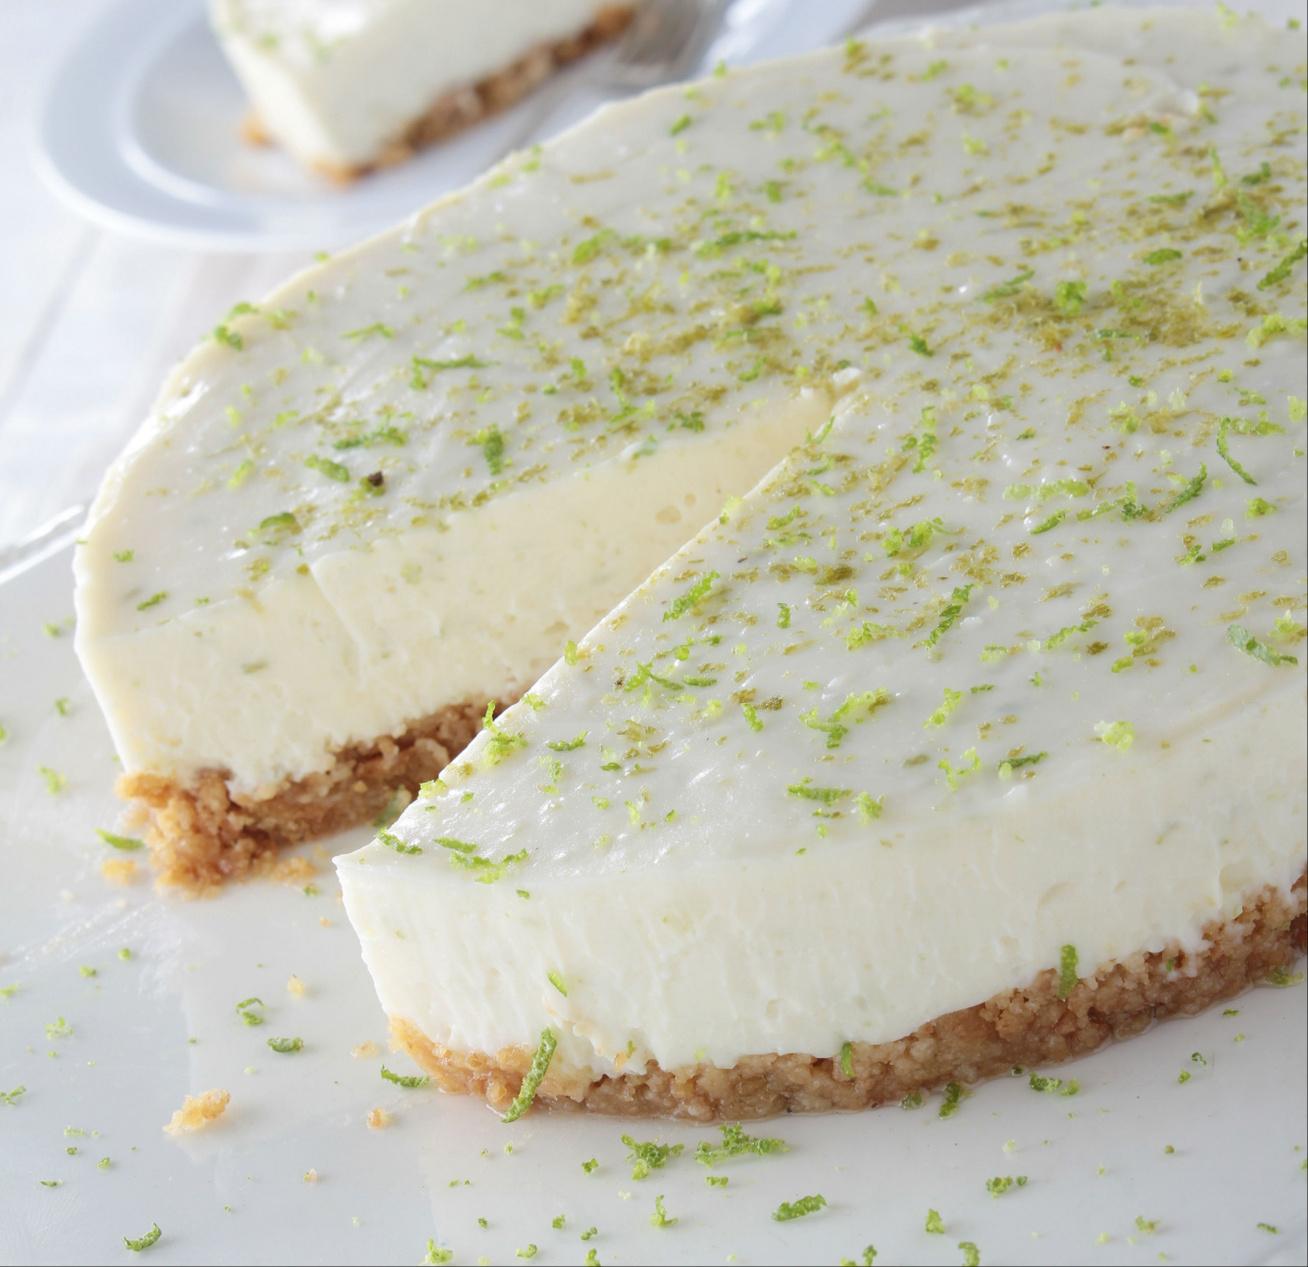 lime-os-sajttorta-recept